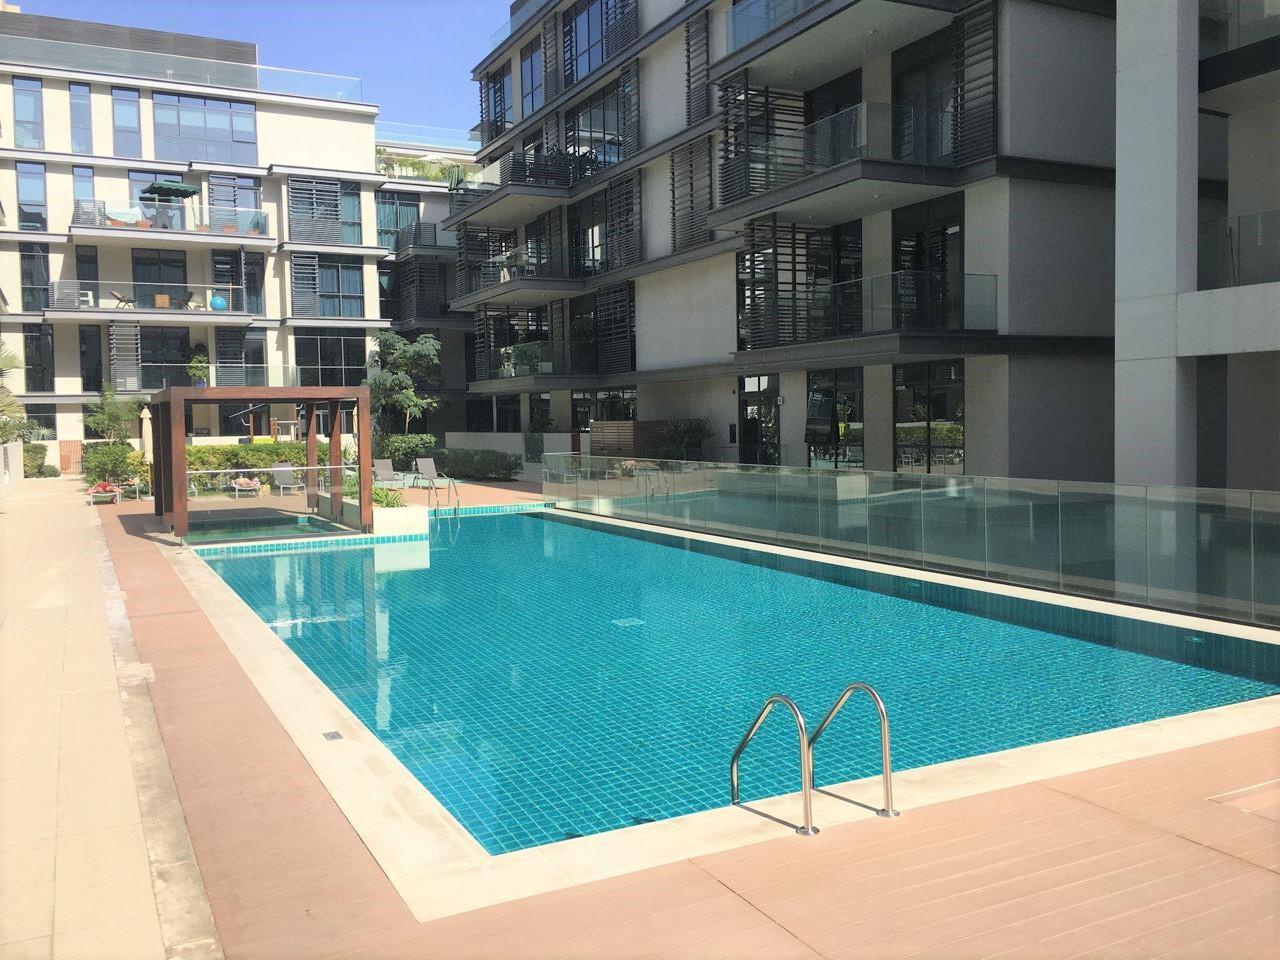 Apartment  Remarkable Value   Unbeatable Location  3 Beds City Walk B 10 309 photo 24142317